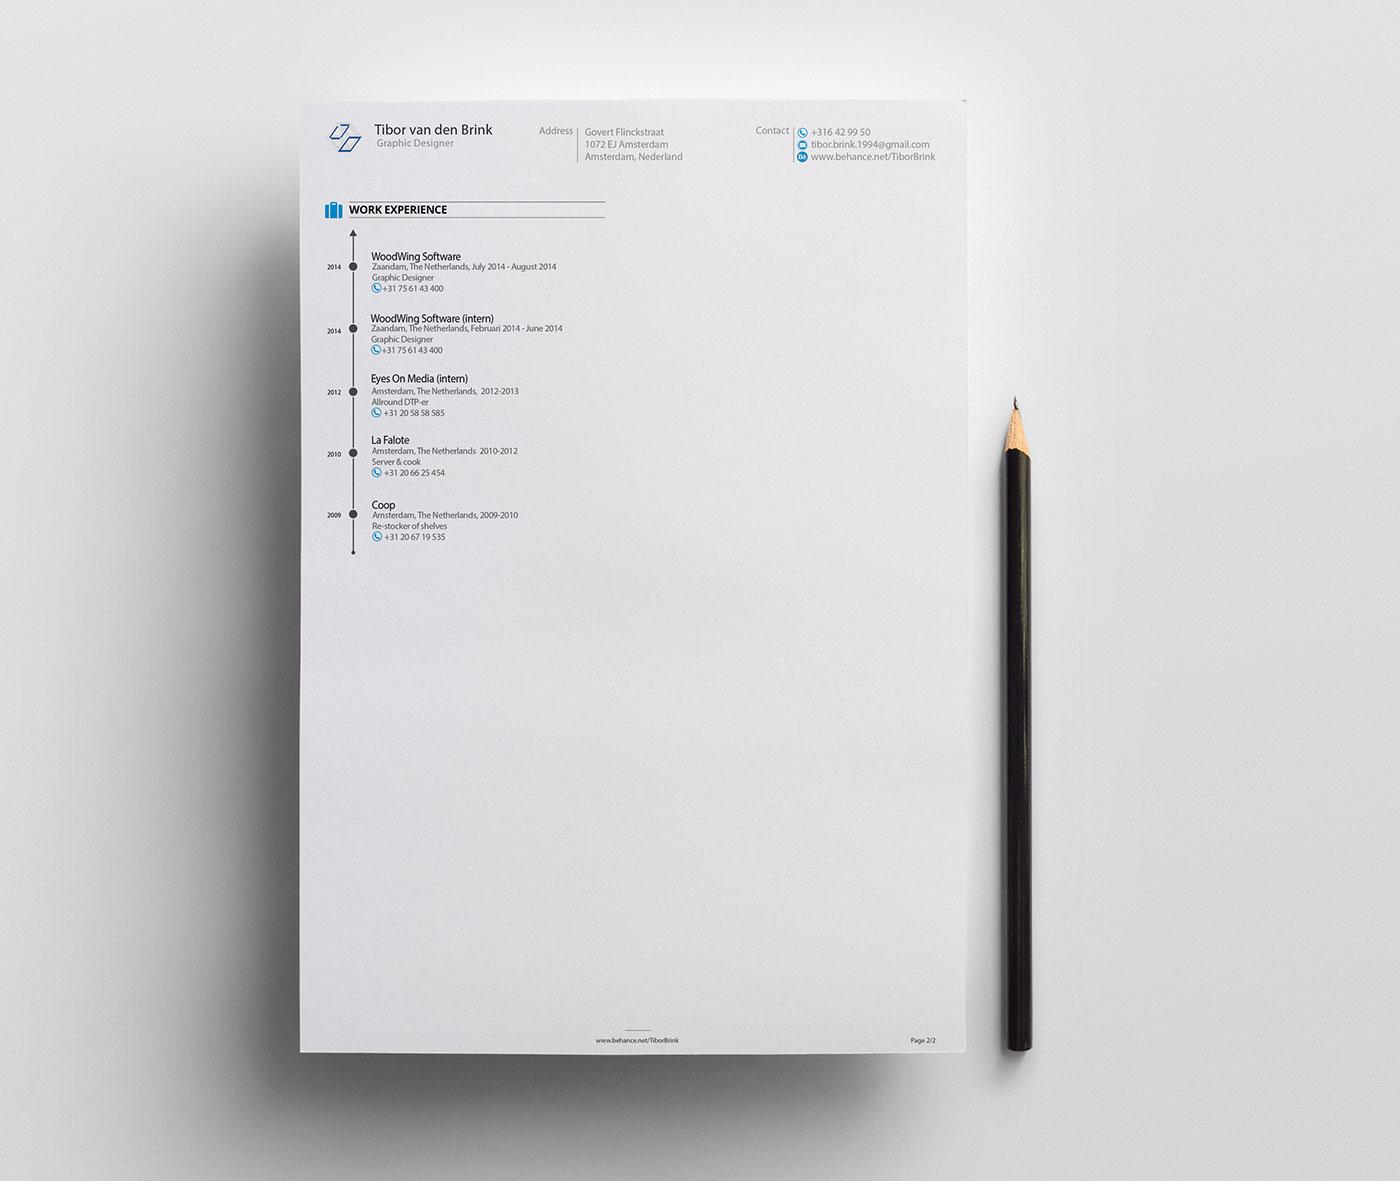 Resume CV brand Promotion Self Promotion resume mock-up Curriculum Vitae creative tibor brink infographic personal